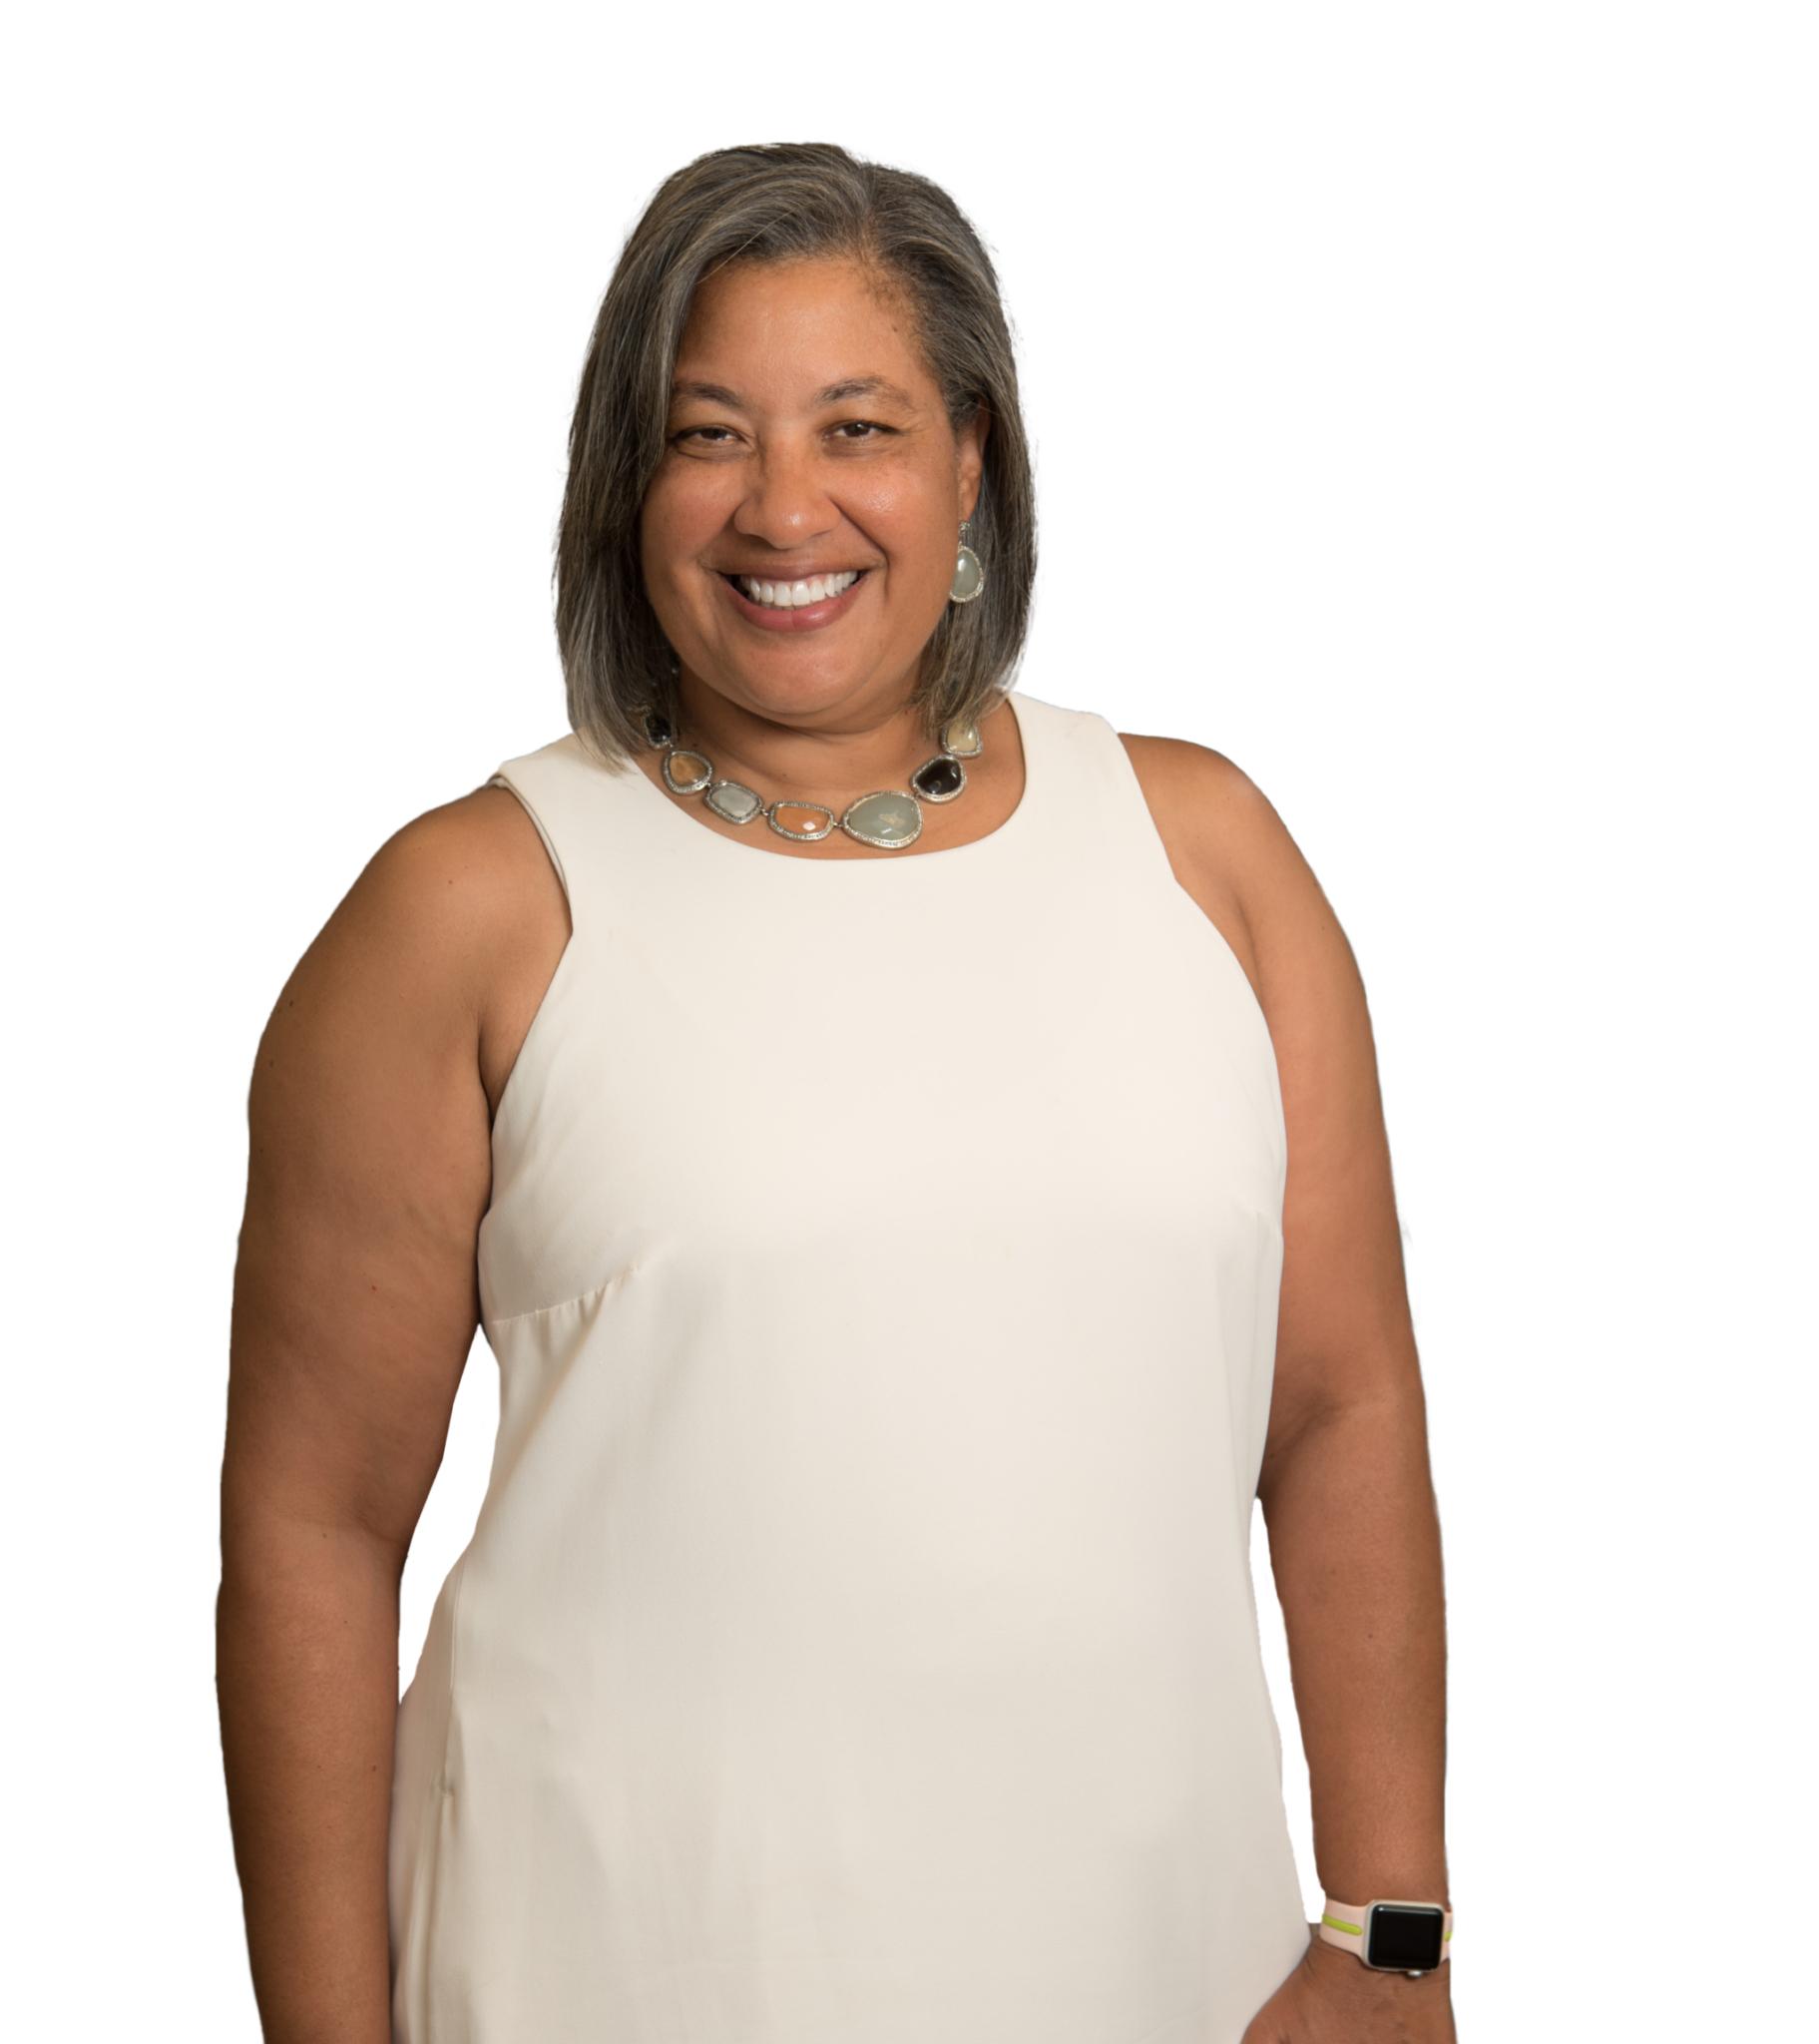 Headshot of Tara Hernandez